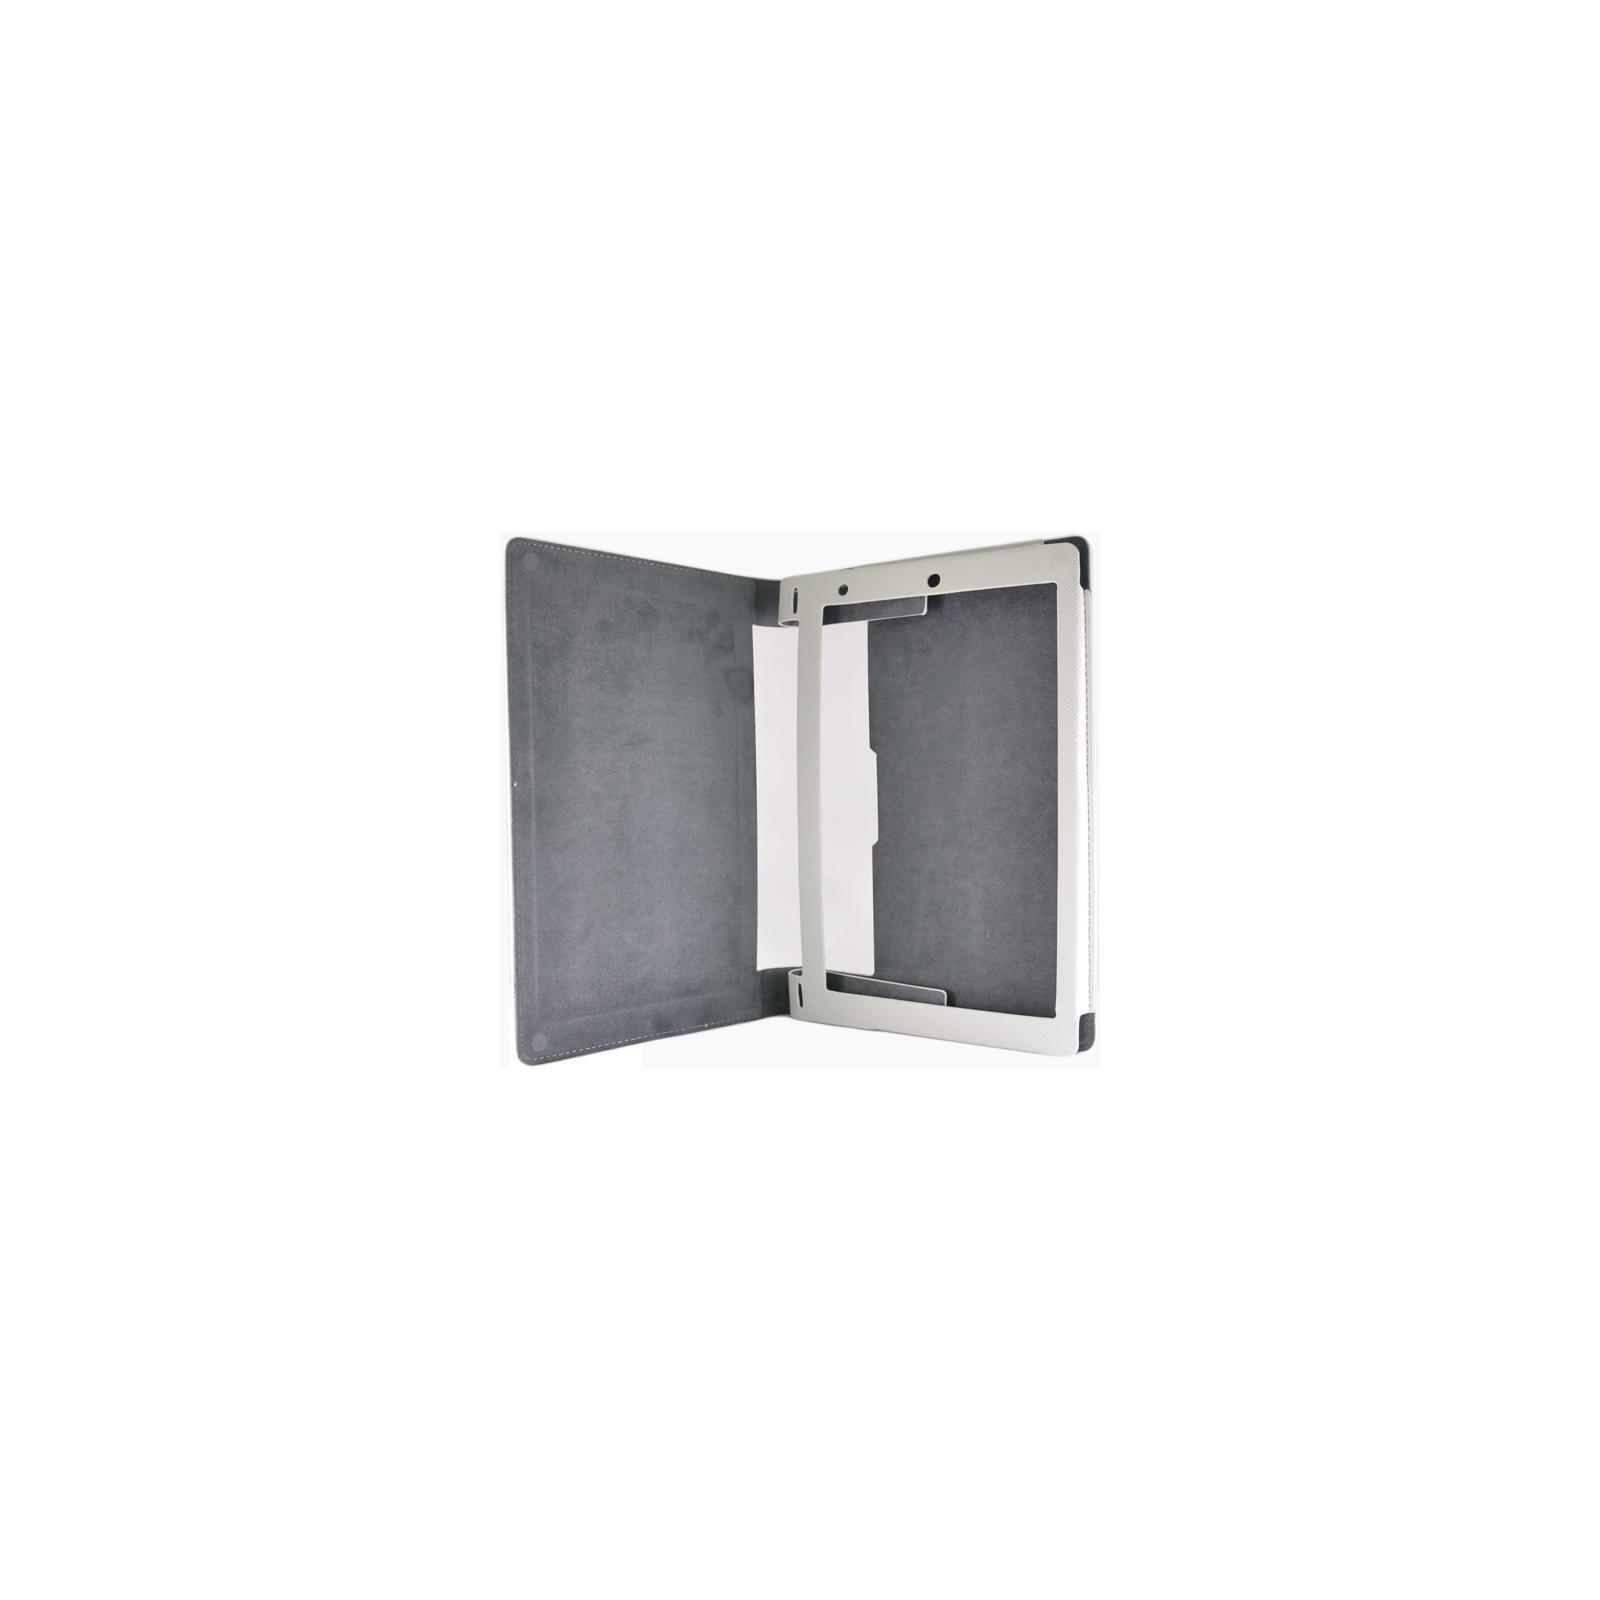 "Чехол для планшета Pro-case для Lenovo B8000 Yoga 10"" white (PC B8000w) изображение 3"